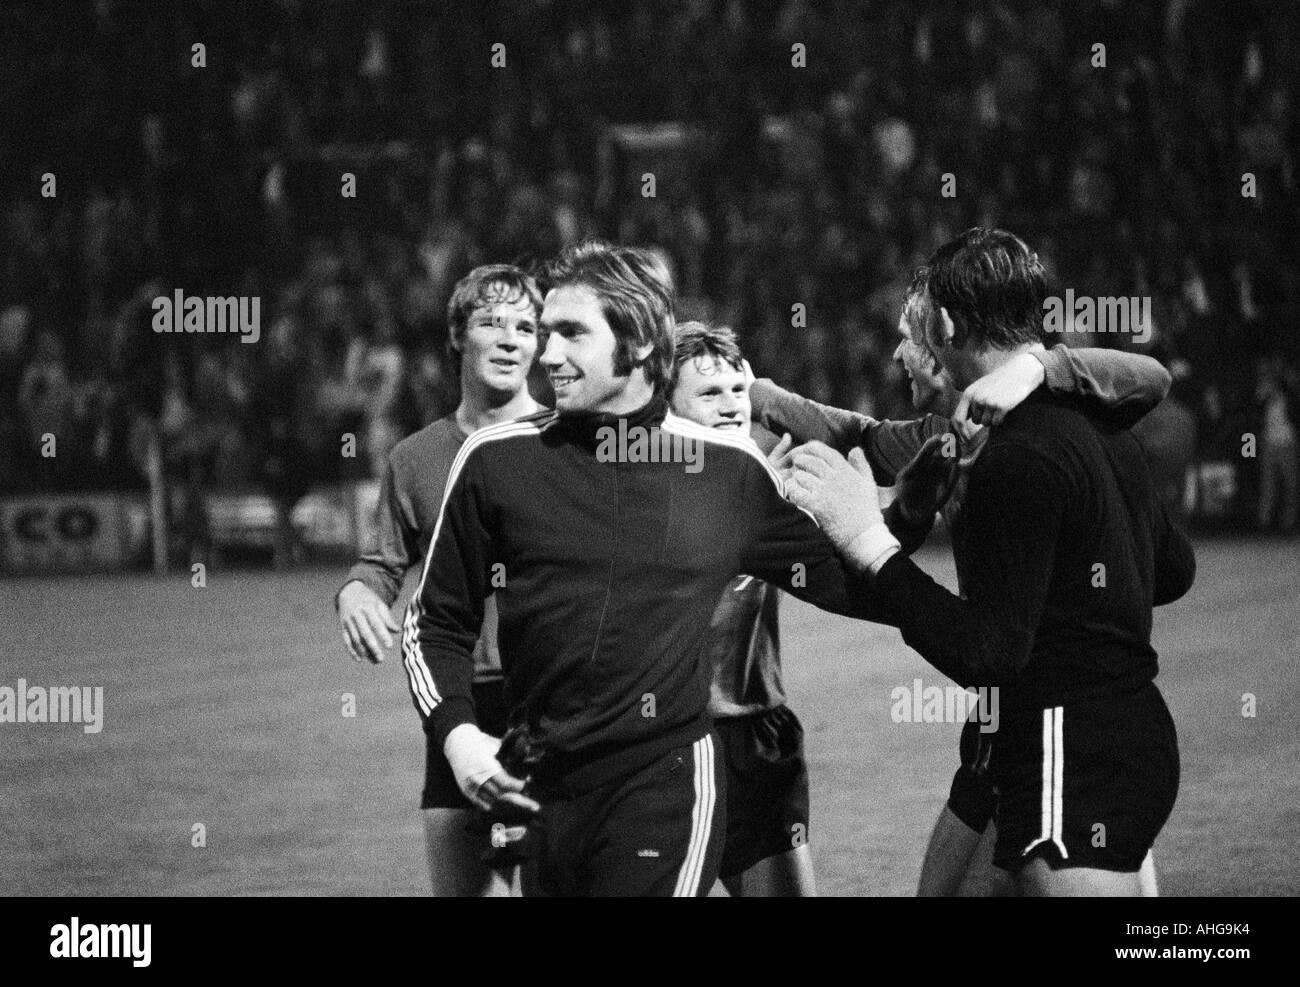 football, Bundesliga, 1970/1971, Borussia Moenchengladbach versus Hanover 96 0:0, Boekelberg Stadium, football players rejoicing at the draw, f.l.t.r. Peter Anders, Peter Loof, Rainer Stiller, keeper Horst Podlasly (all 96) - Stock Image